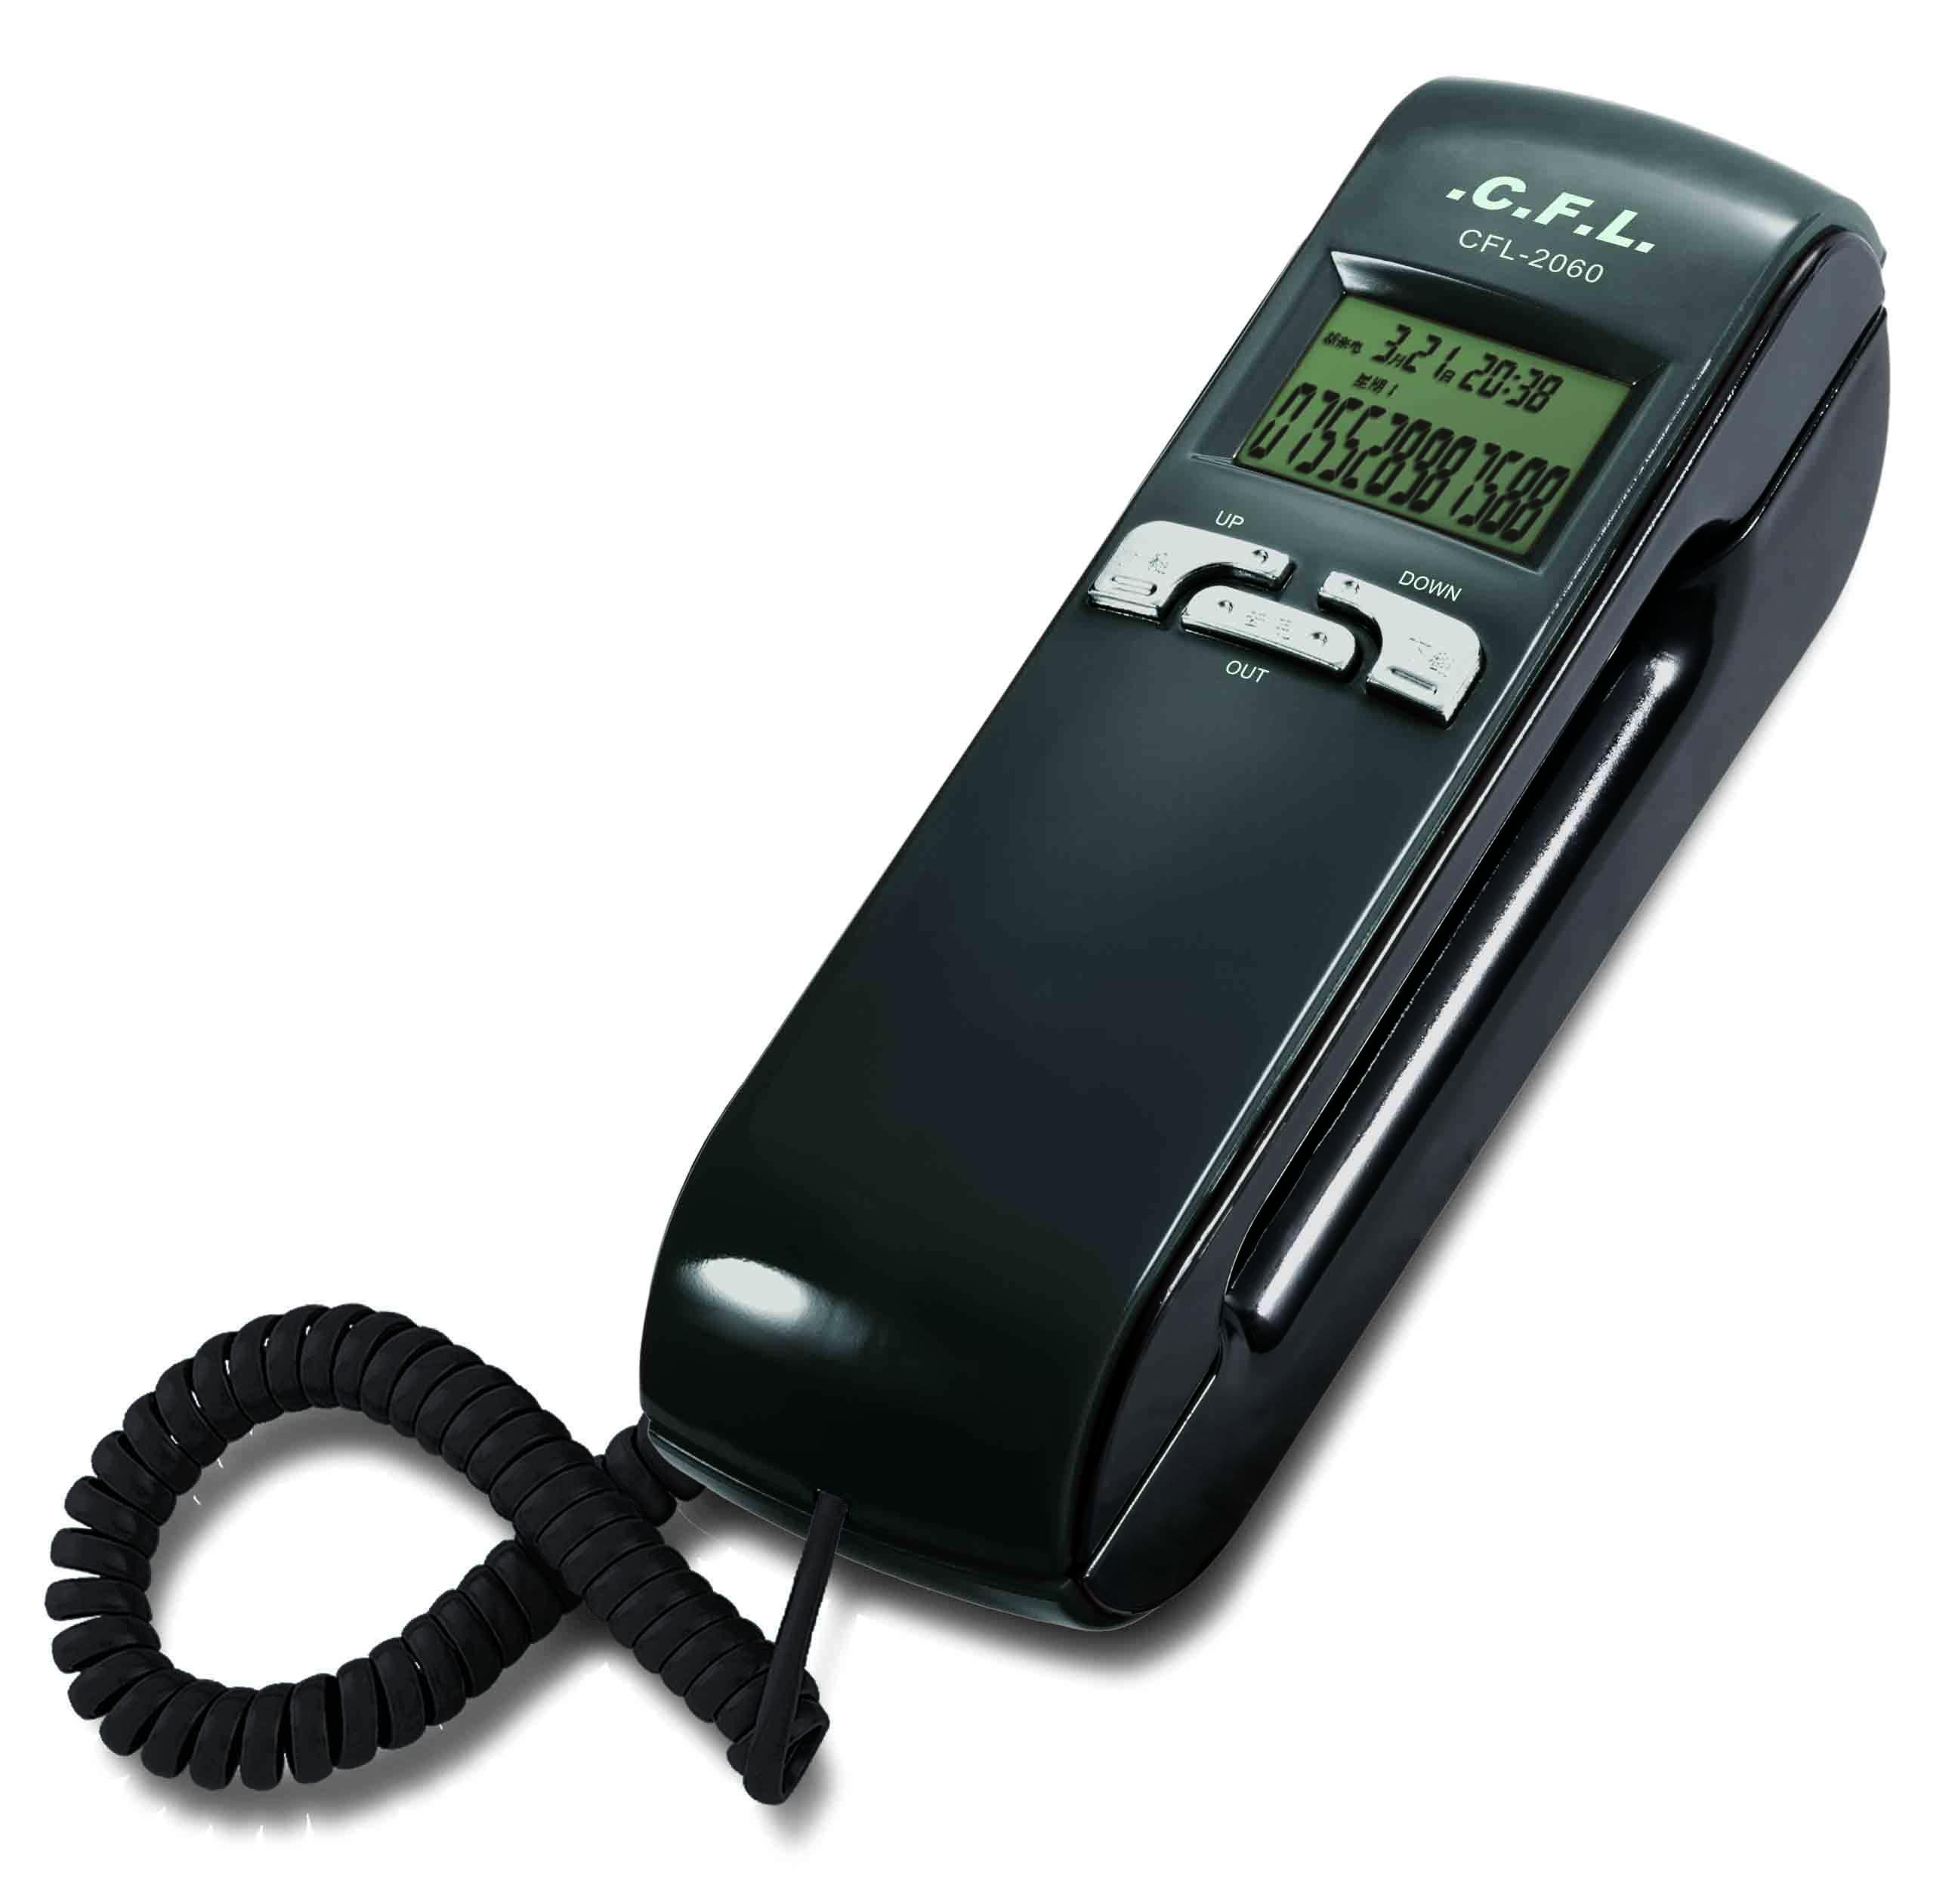 تلفن سی اف ال مدل 2060